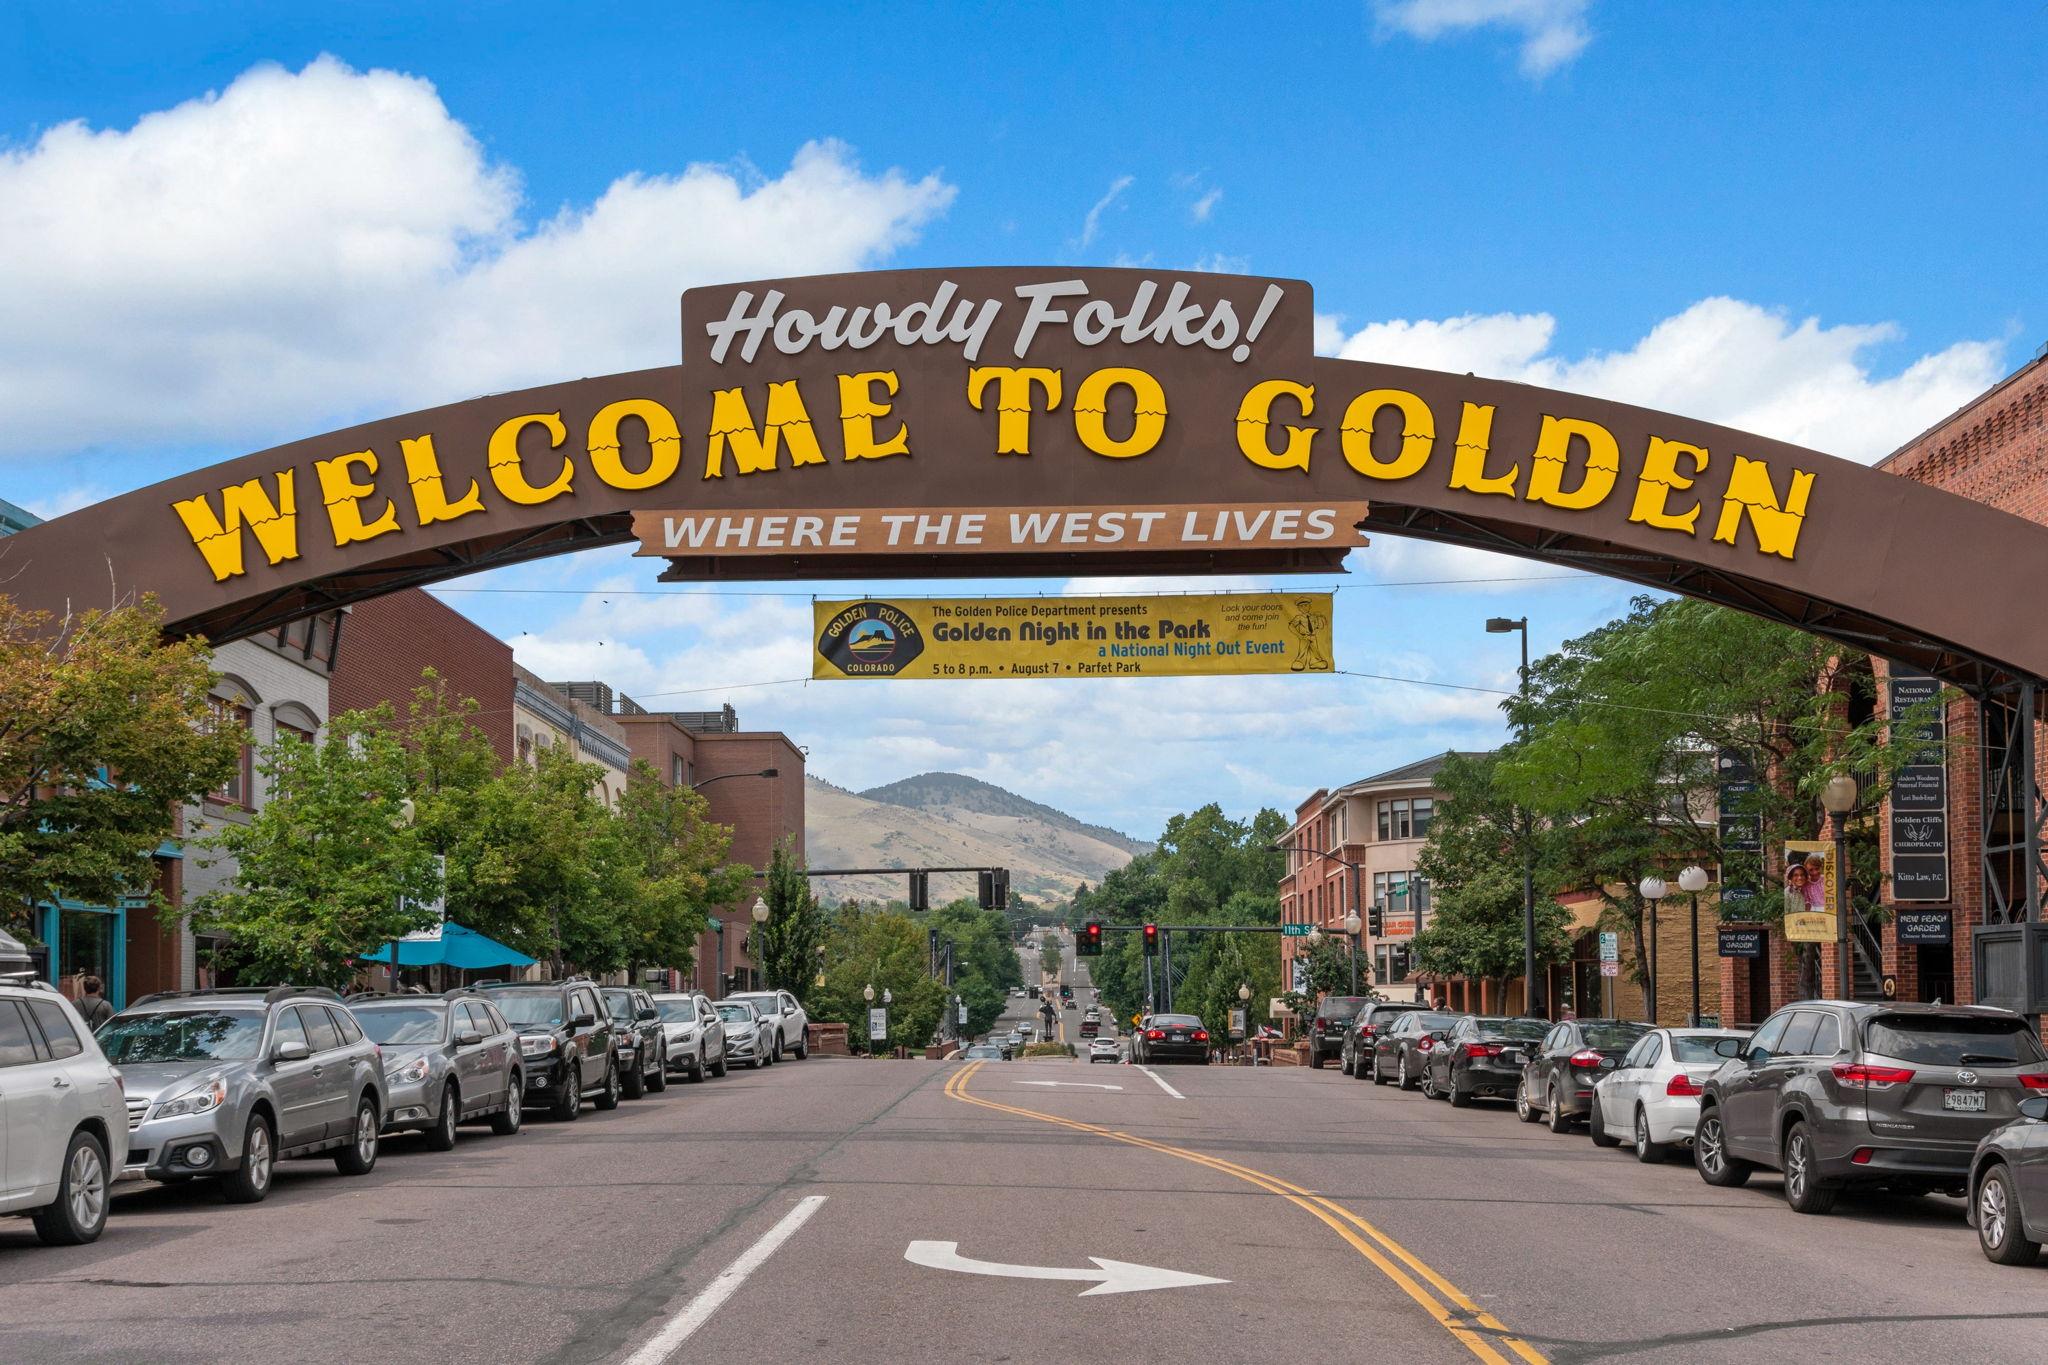 Golden Neighborhood